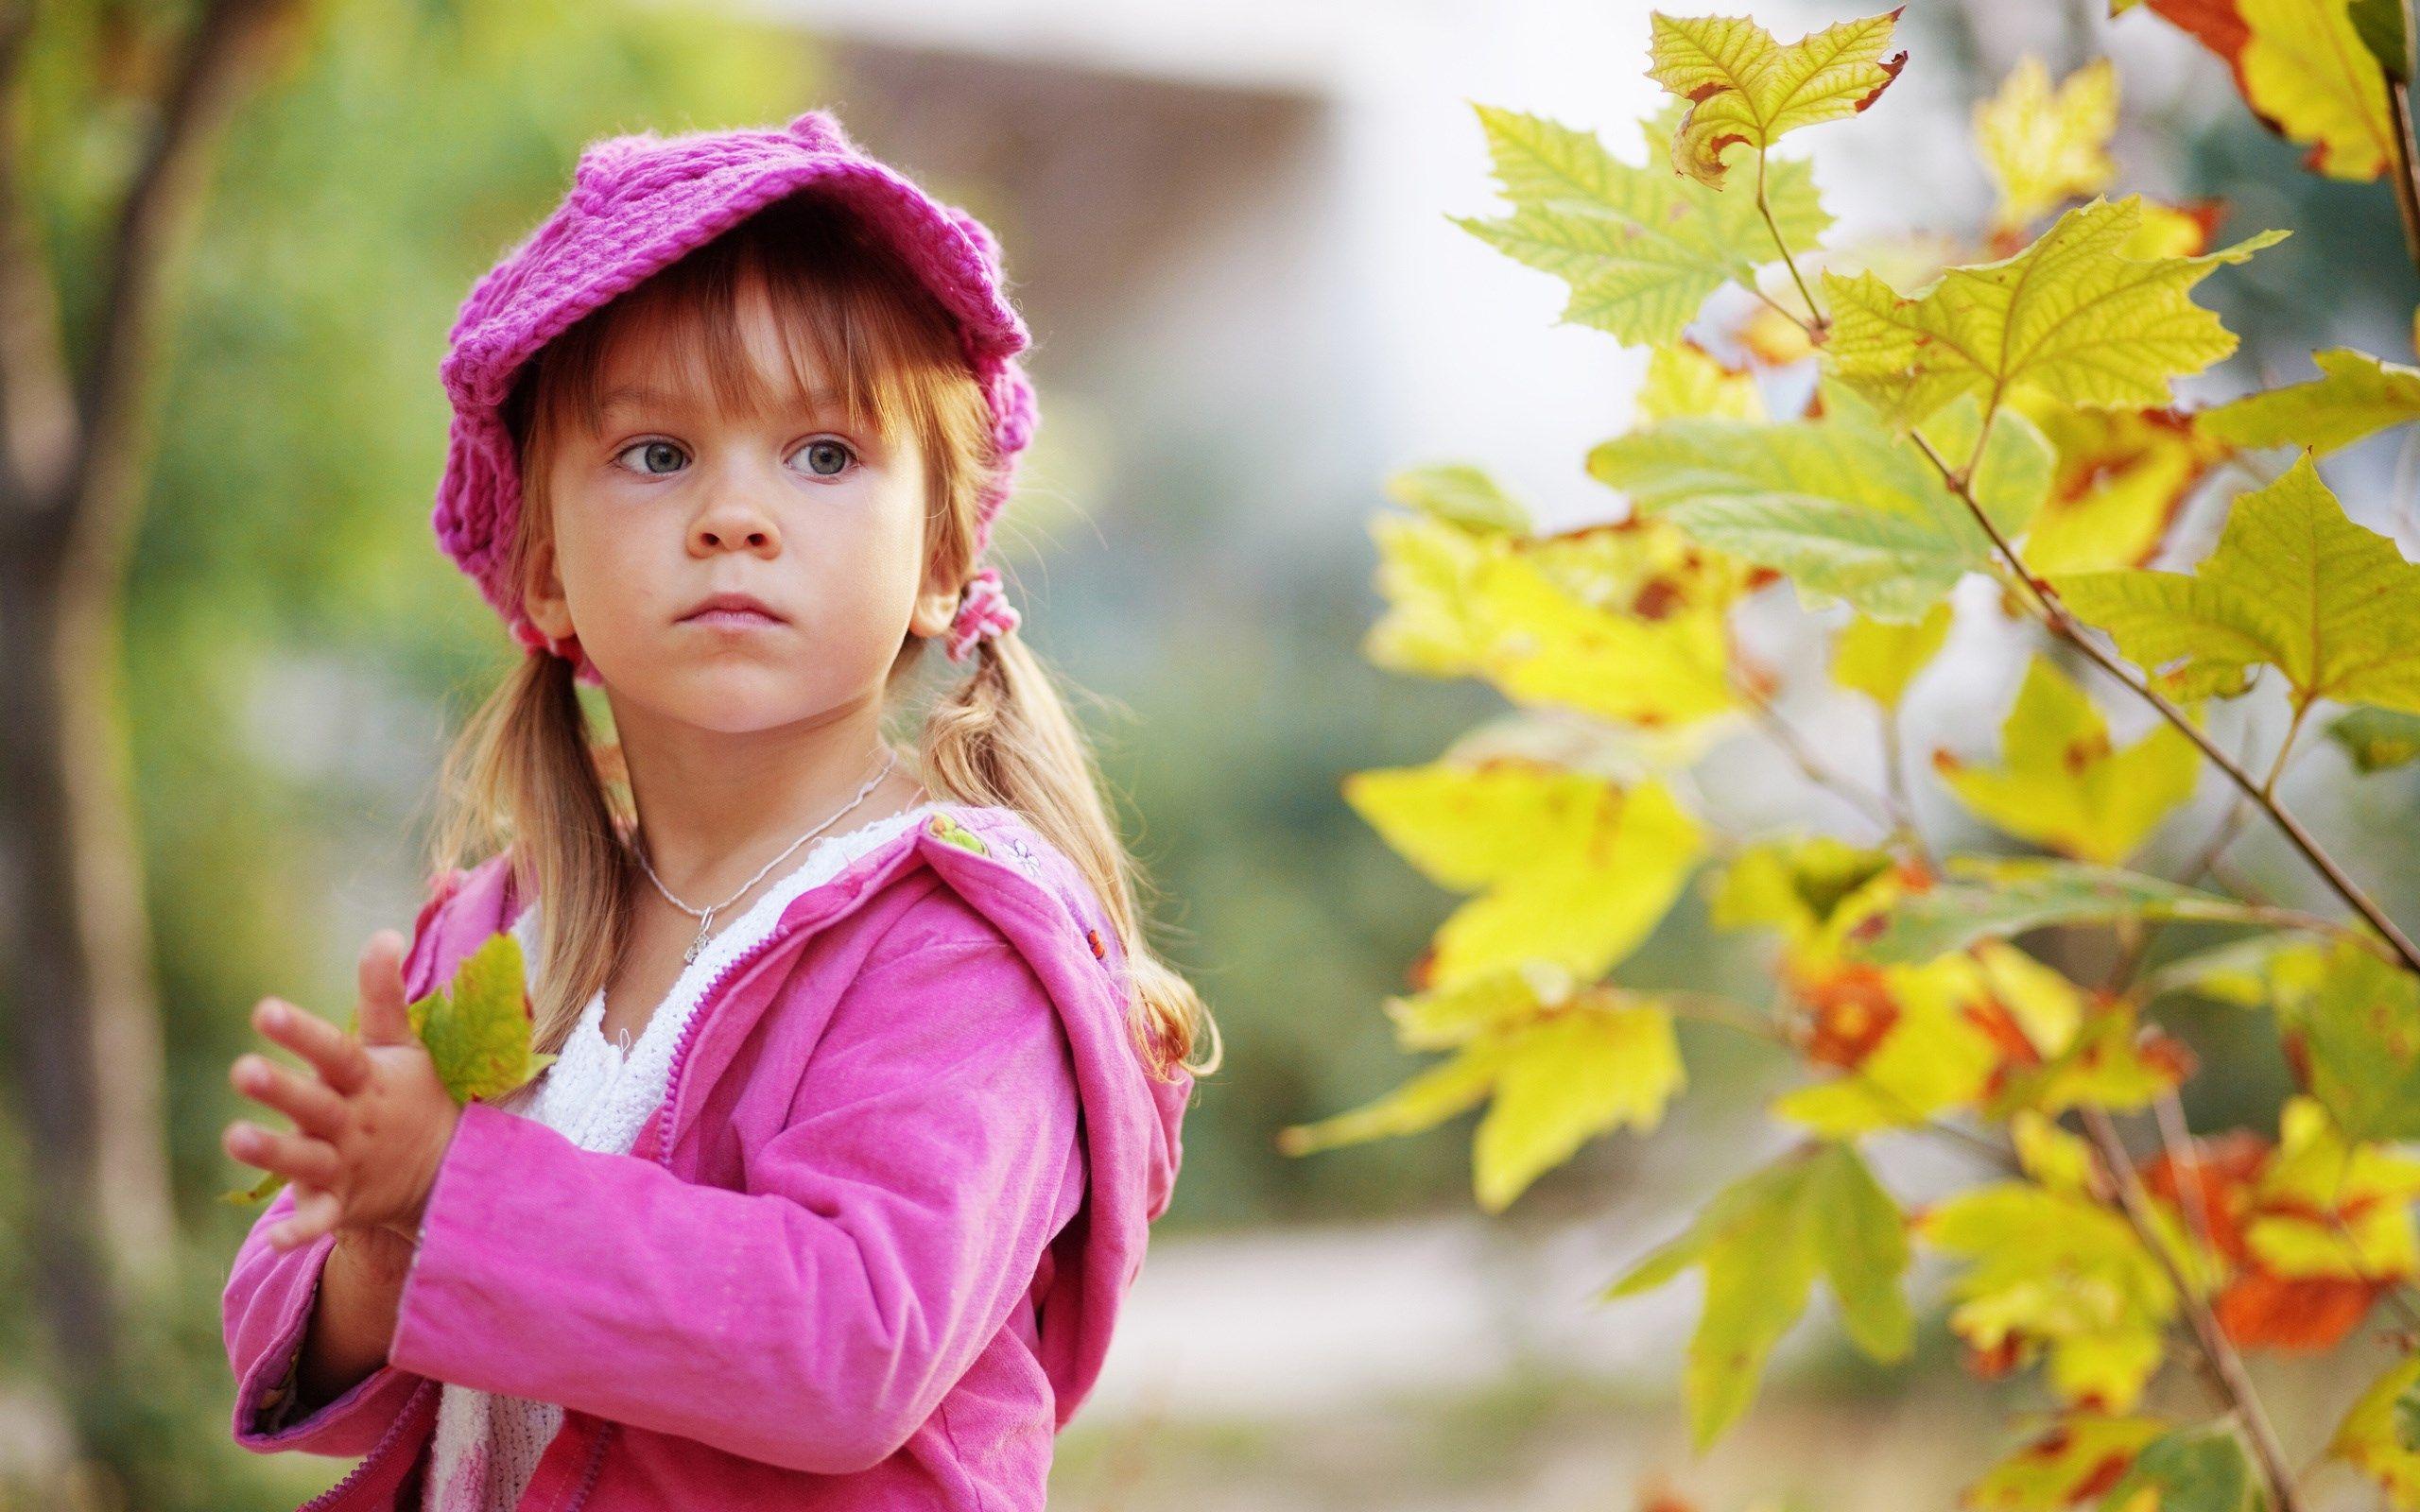 wallpaper images child - child category | gogolmogol | pinterest | child